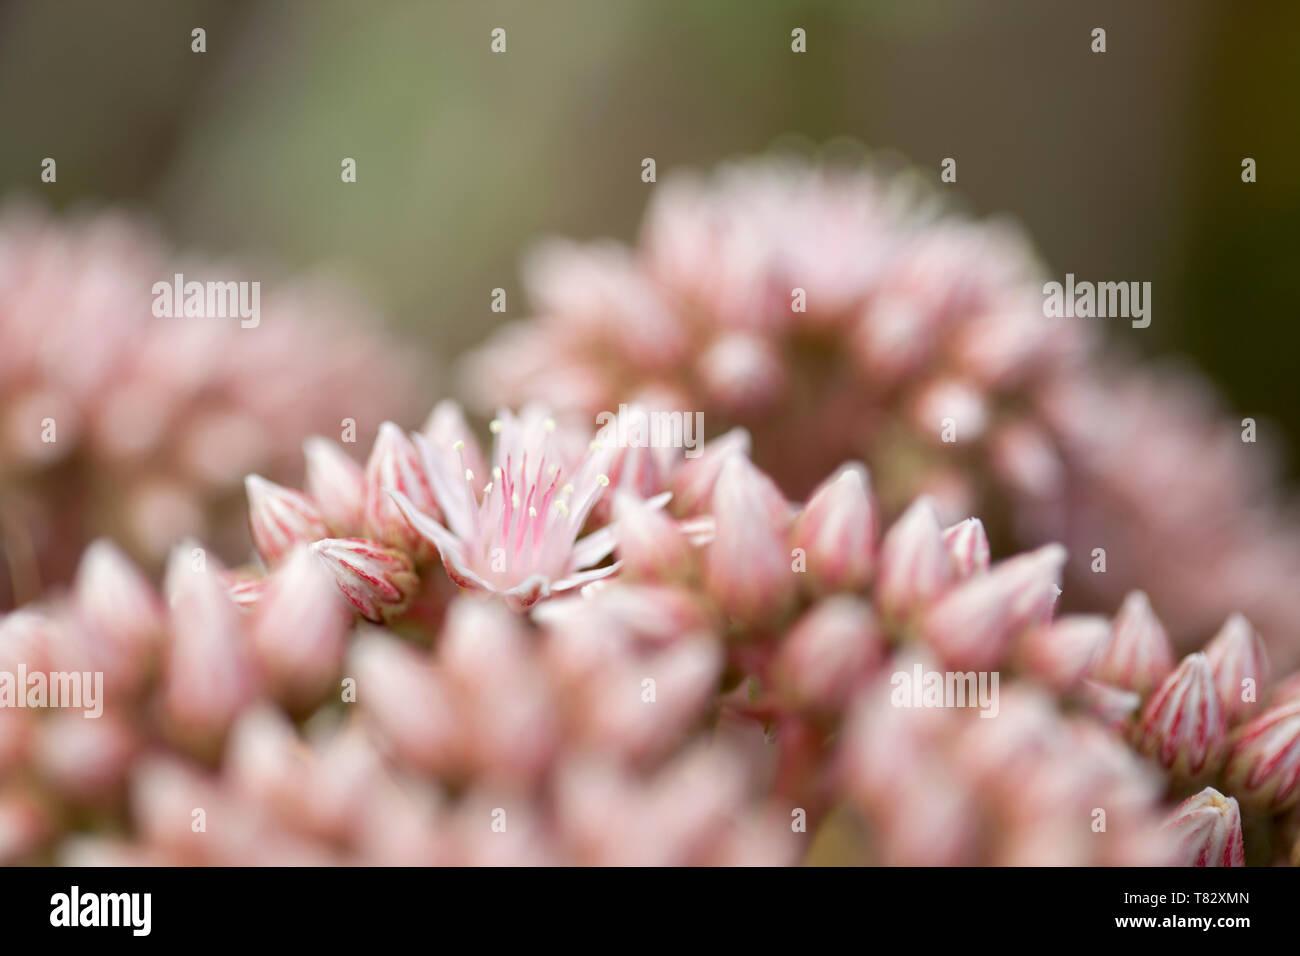 Flora of Gran Canaria - pink flowers of succulent plant ... on lady's mantle plant, hyssop plant, scilla violacea plant, hellebore plant, poppy plant, gold flower plant, bottling plant, daffodil plant, hops plant, yarrow plant, lemon verbena plant, lemon balm plant, goat's beard plant, catmint plant, sage plant, perennial plant, birch plant, thyme plant, holly plant,